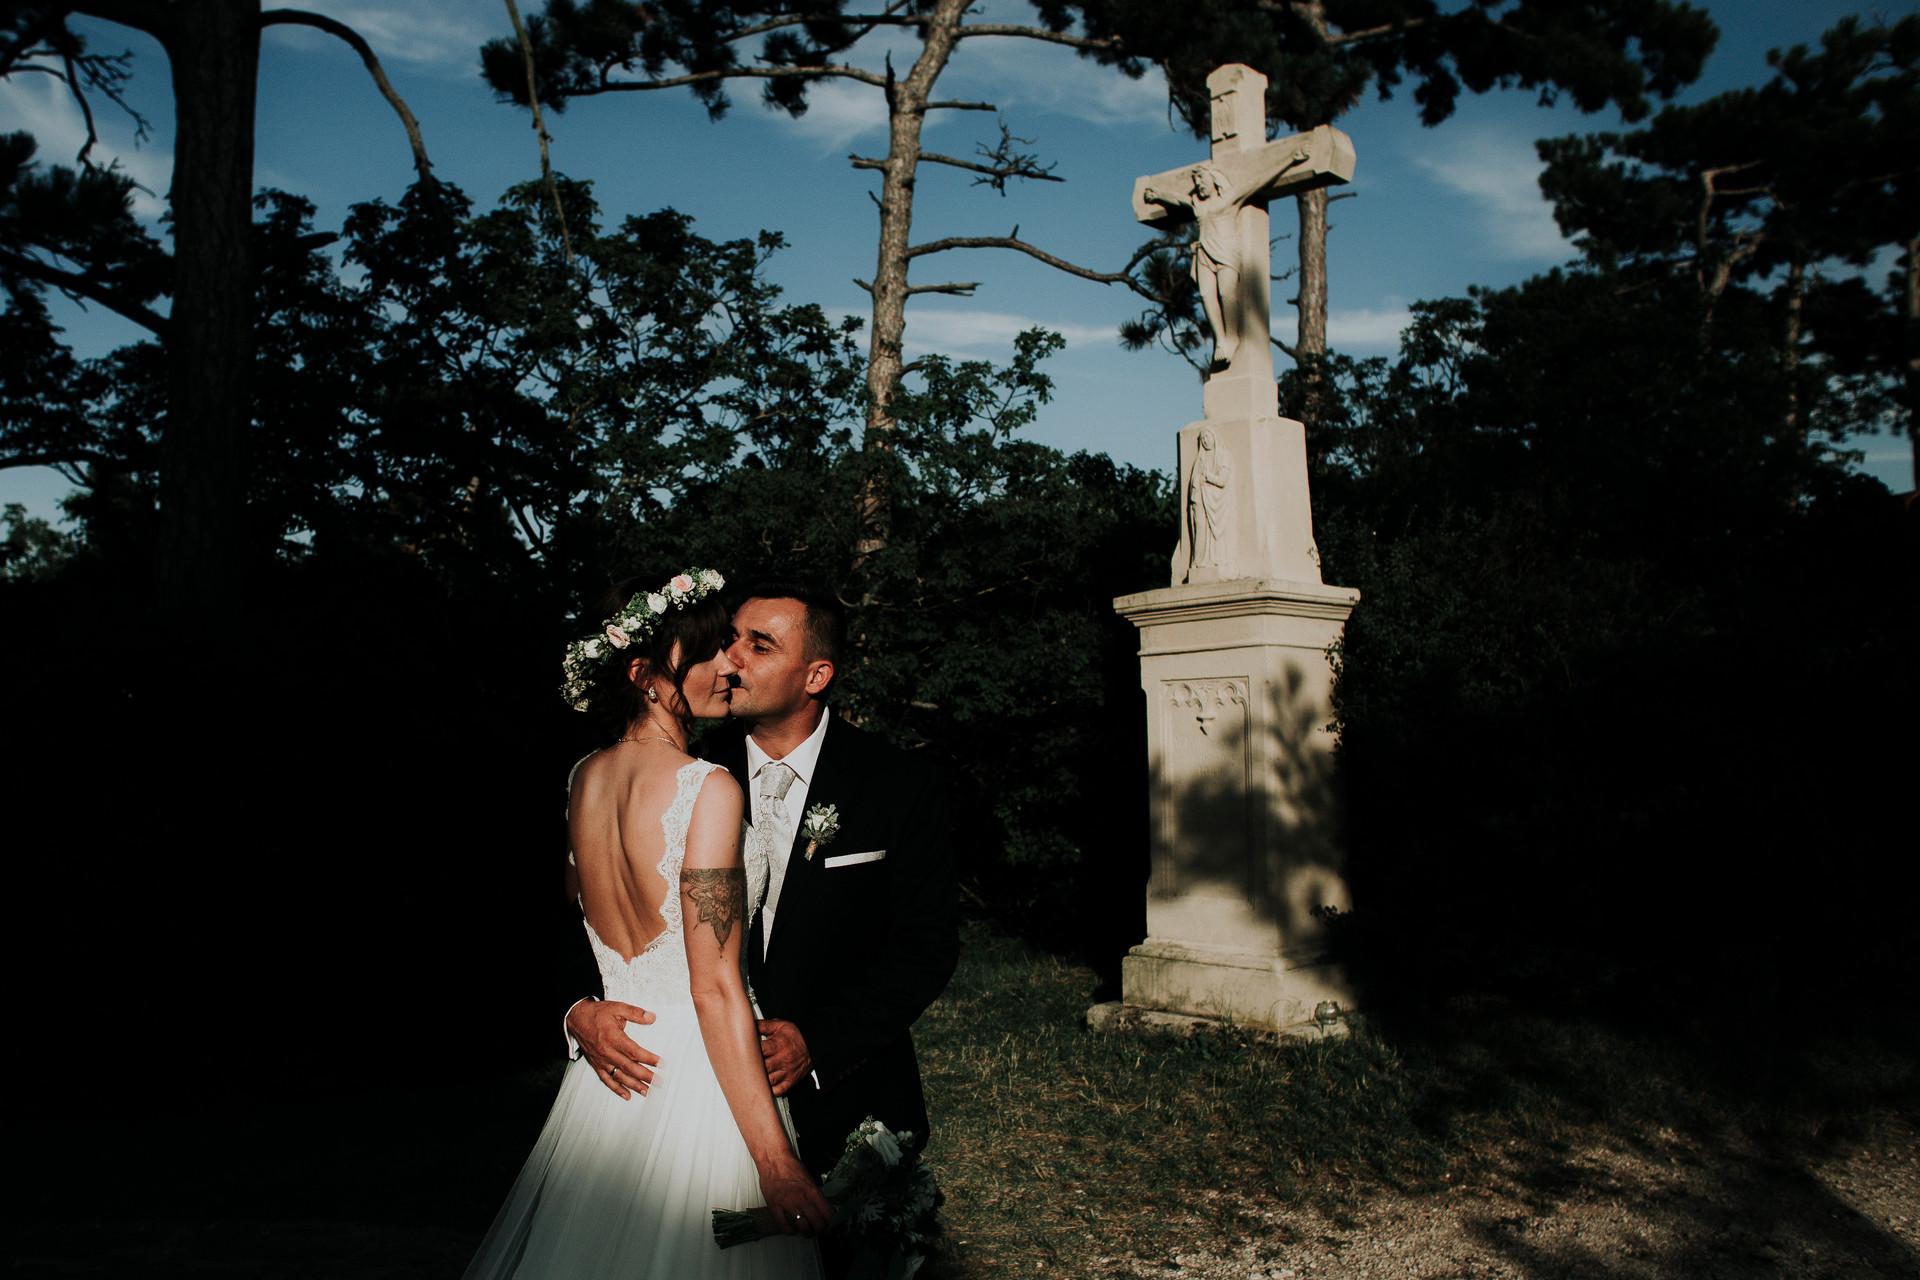 Hungary wedding 7.JPG